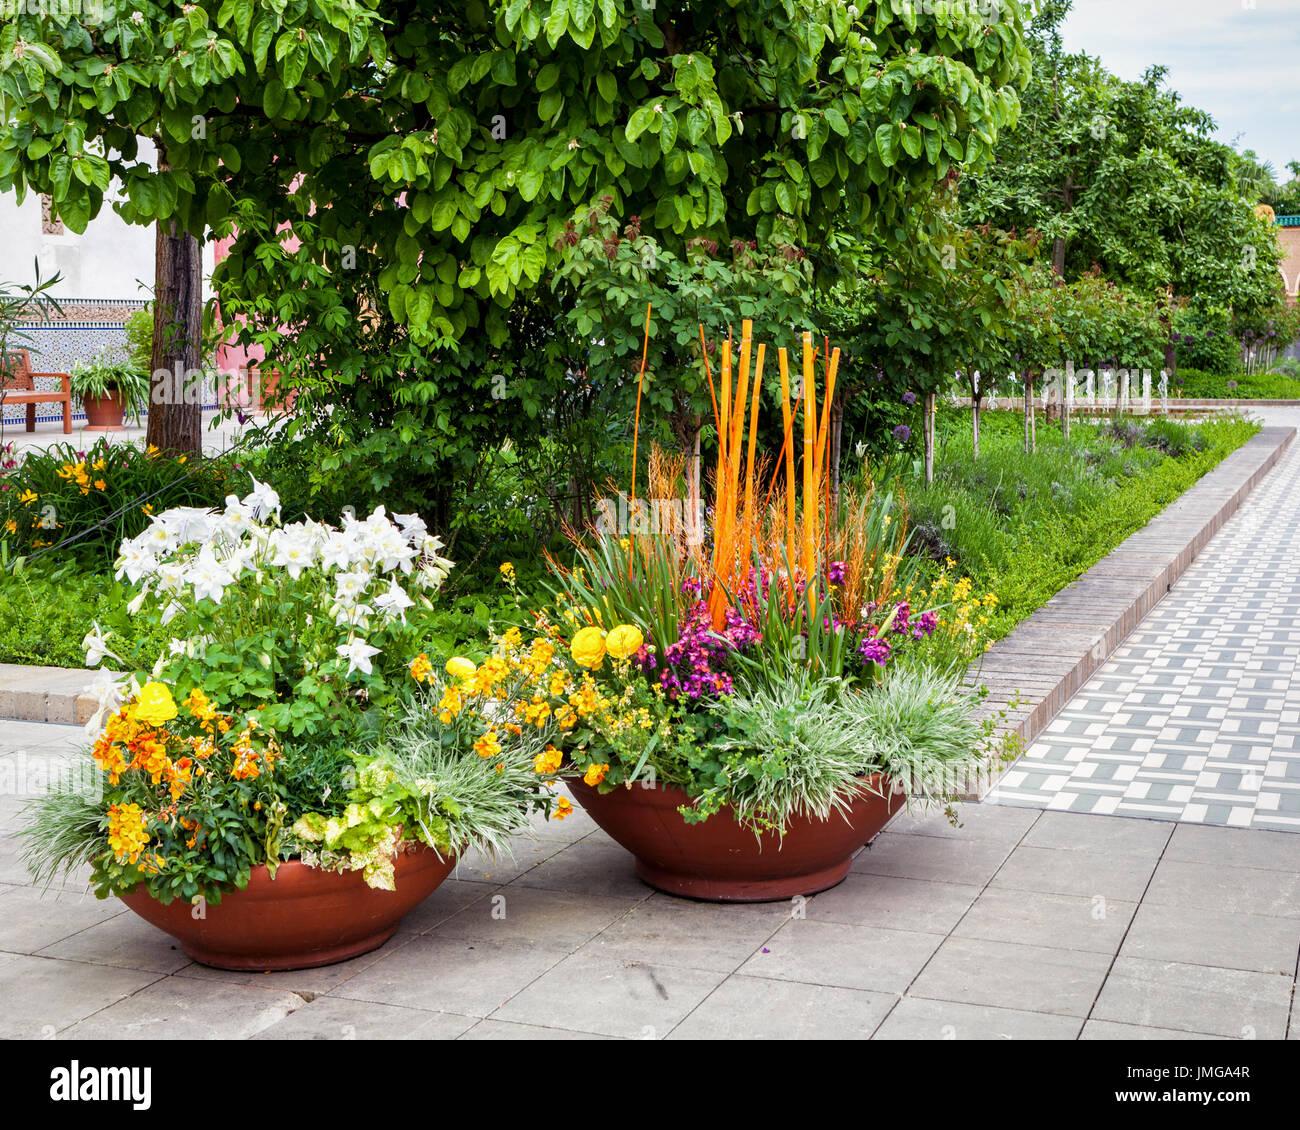 potplants stock photos potplants stock images alamy. Black Bedroom Furniture Sets. Home Design Ideas